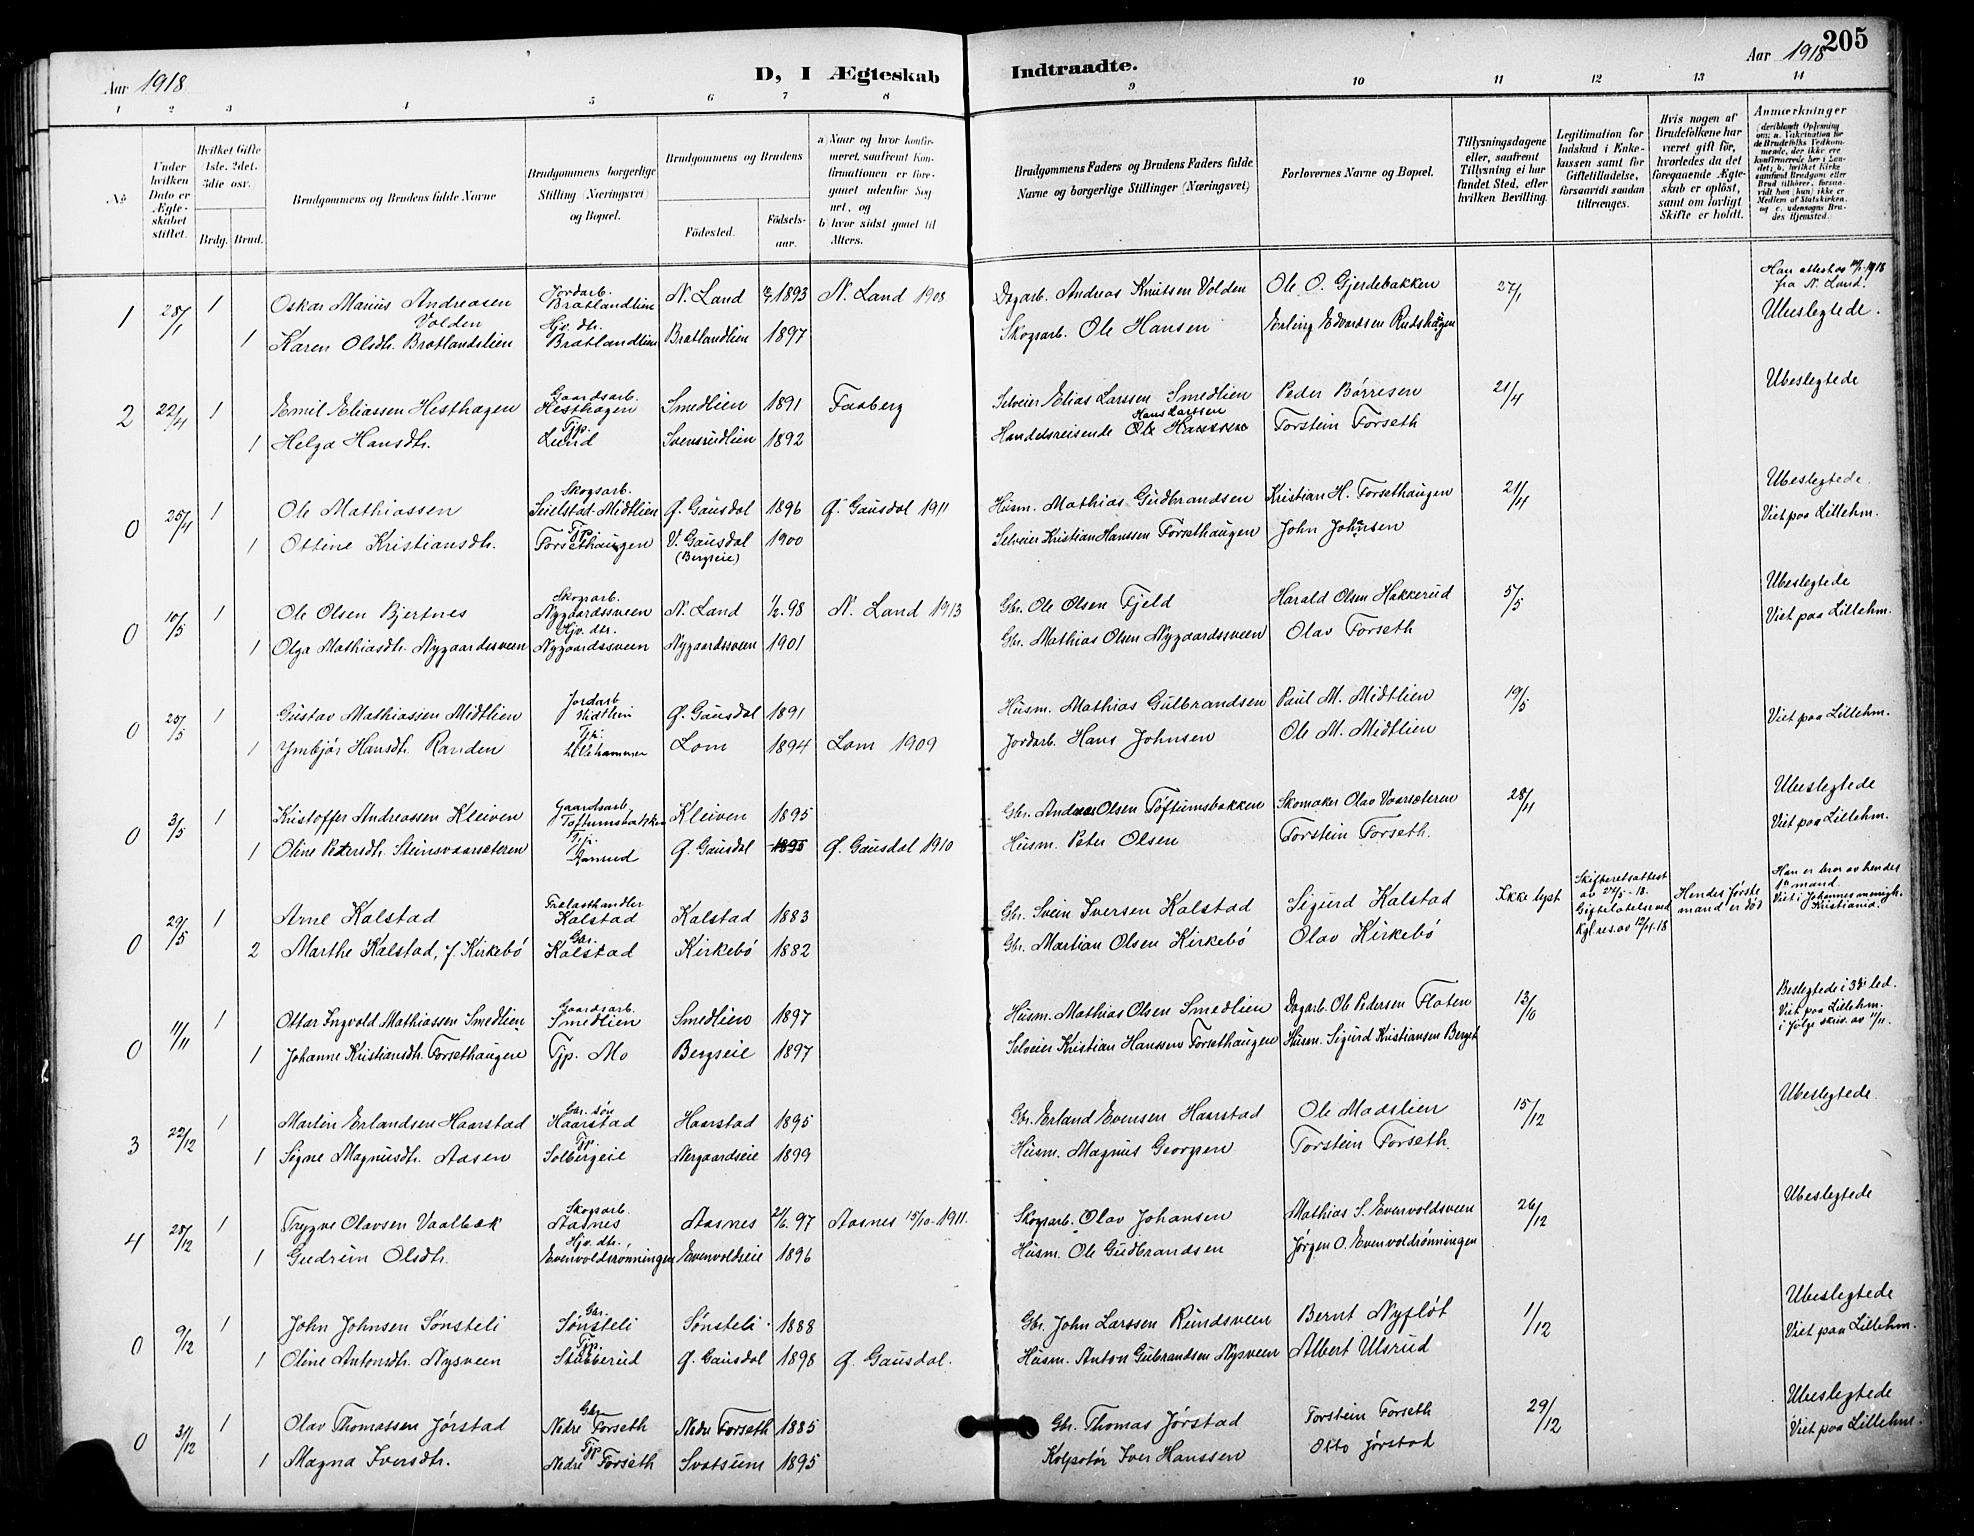 SAH, Vestre Gausdal prestekontor, Klokkerbok nr. 3, 1896-1925, s. 205